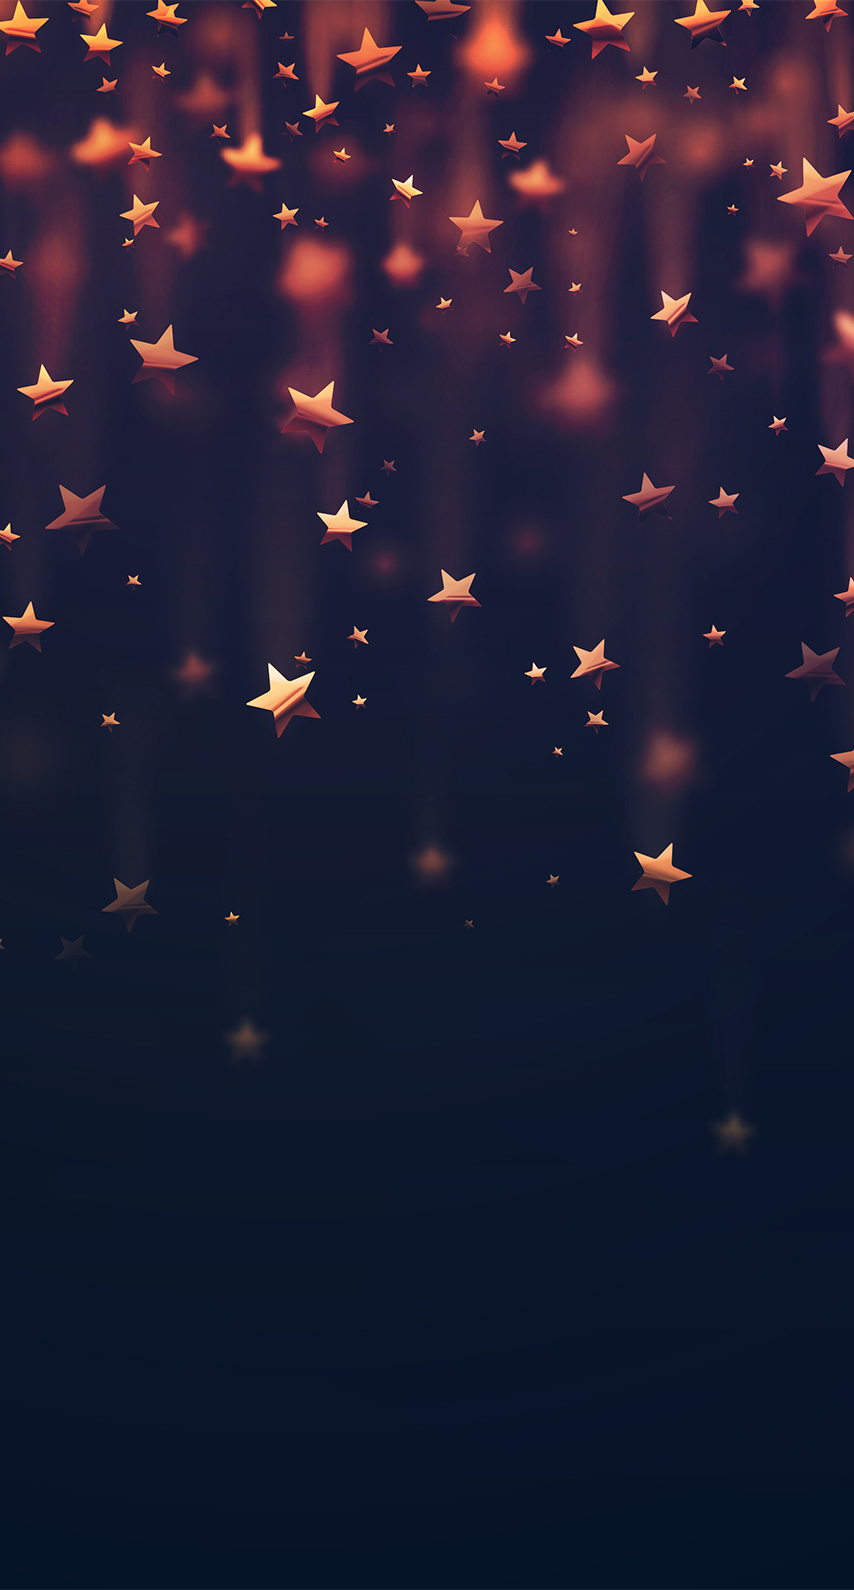 illustration, blur, no person, luminescence, shining, decoration, glisten, illuminated, sparkling, starry